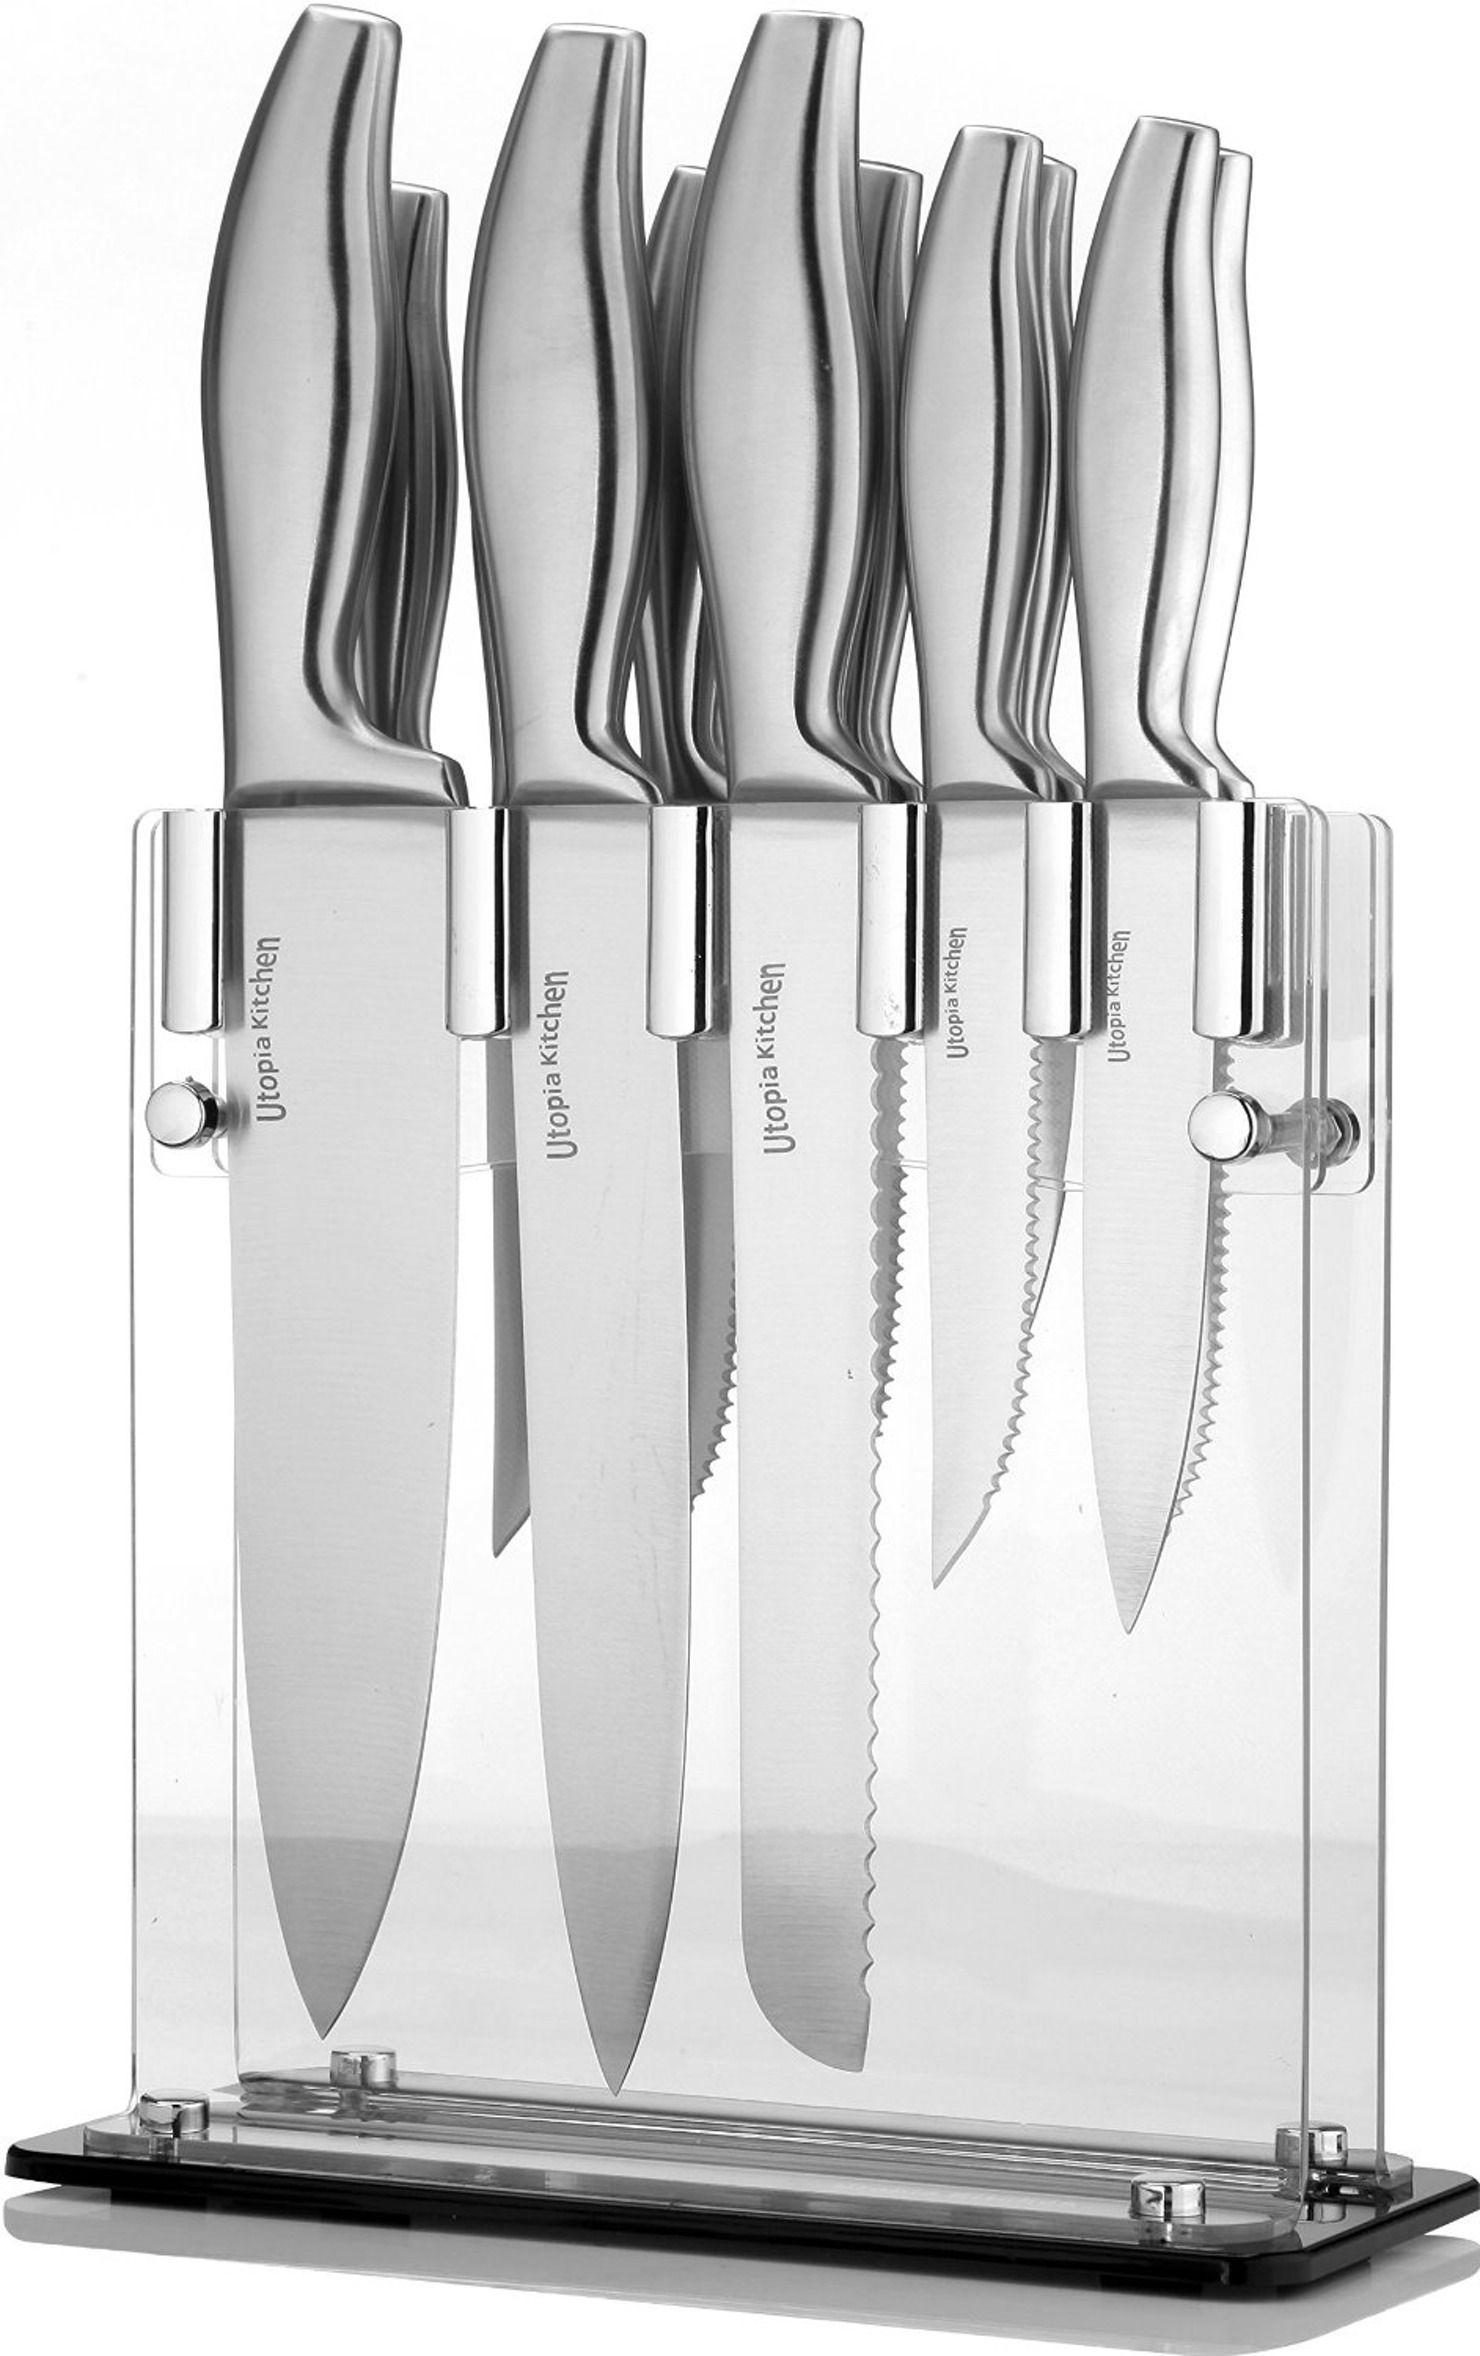 25 Bizarrely Popular Gifts For Parents Trending On Amazon Best Kitchen Knife Set Knife Set Kitchen Best Kitchen Knives